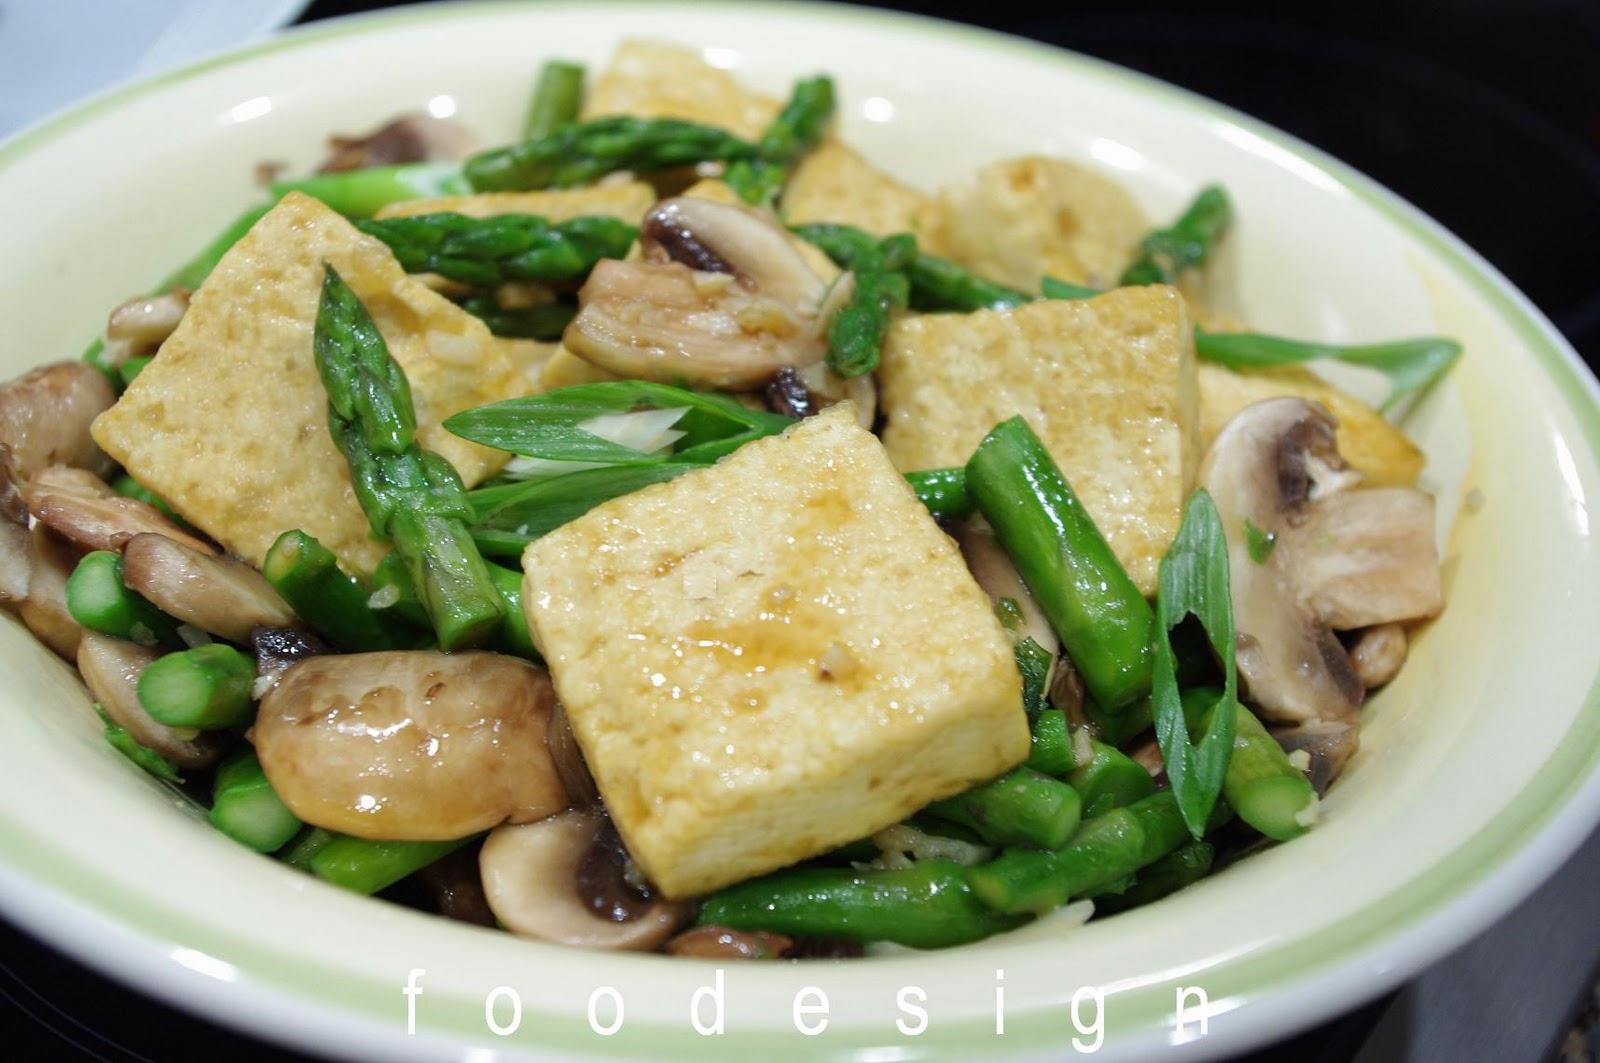 foodesign: tofu and asparagus stir fry